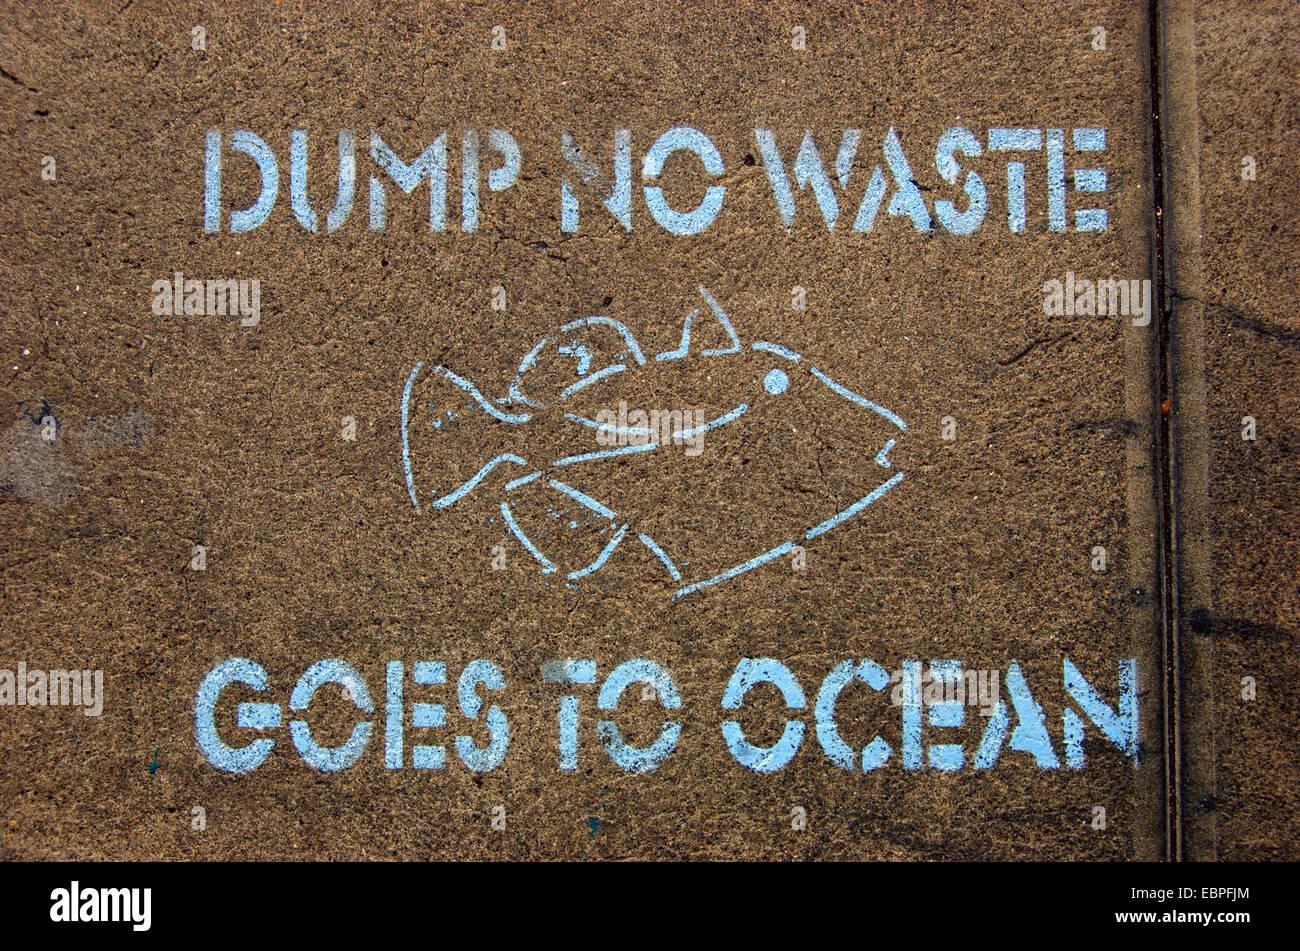 Dump No Waste Sign - Stock Image